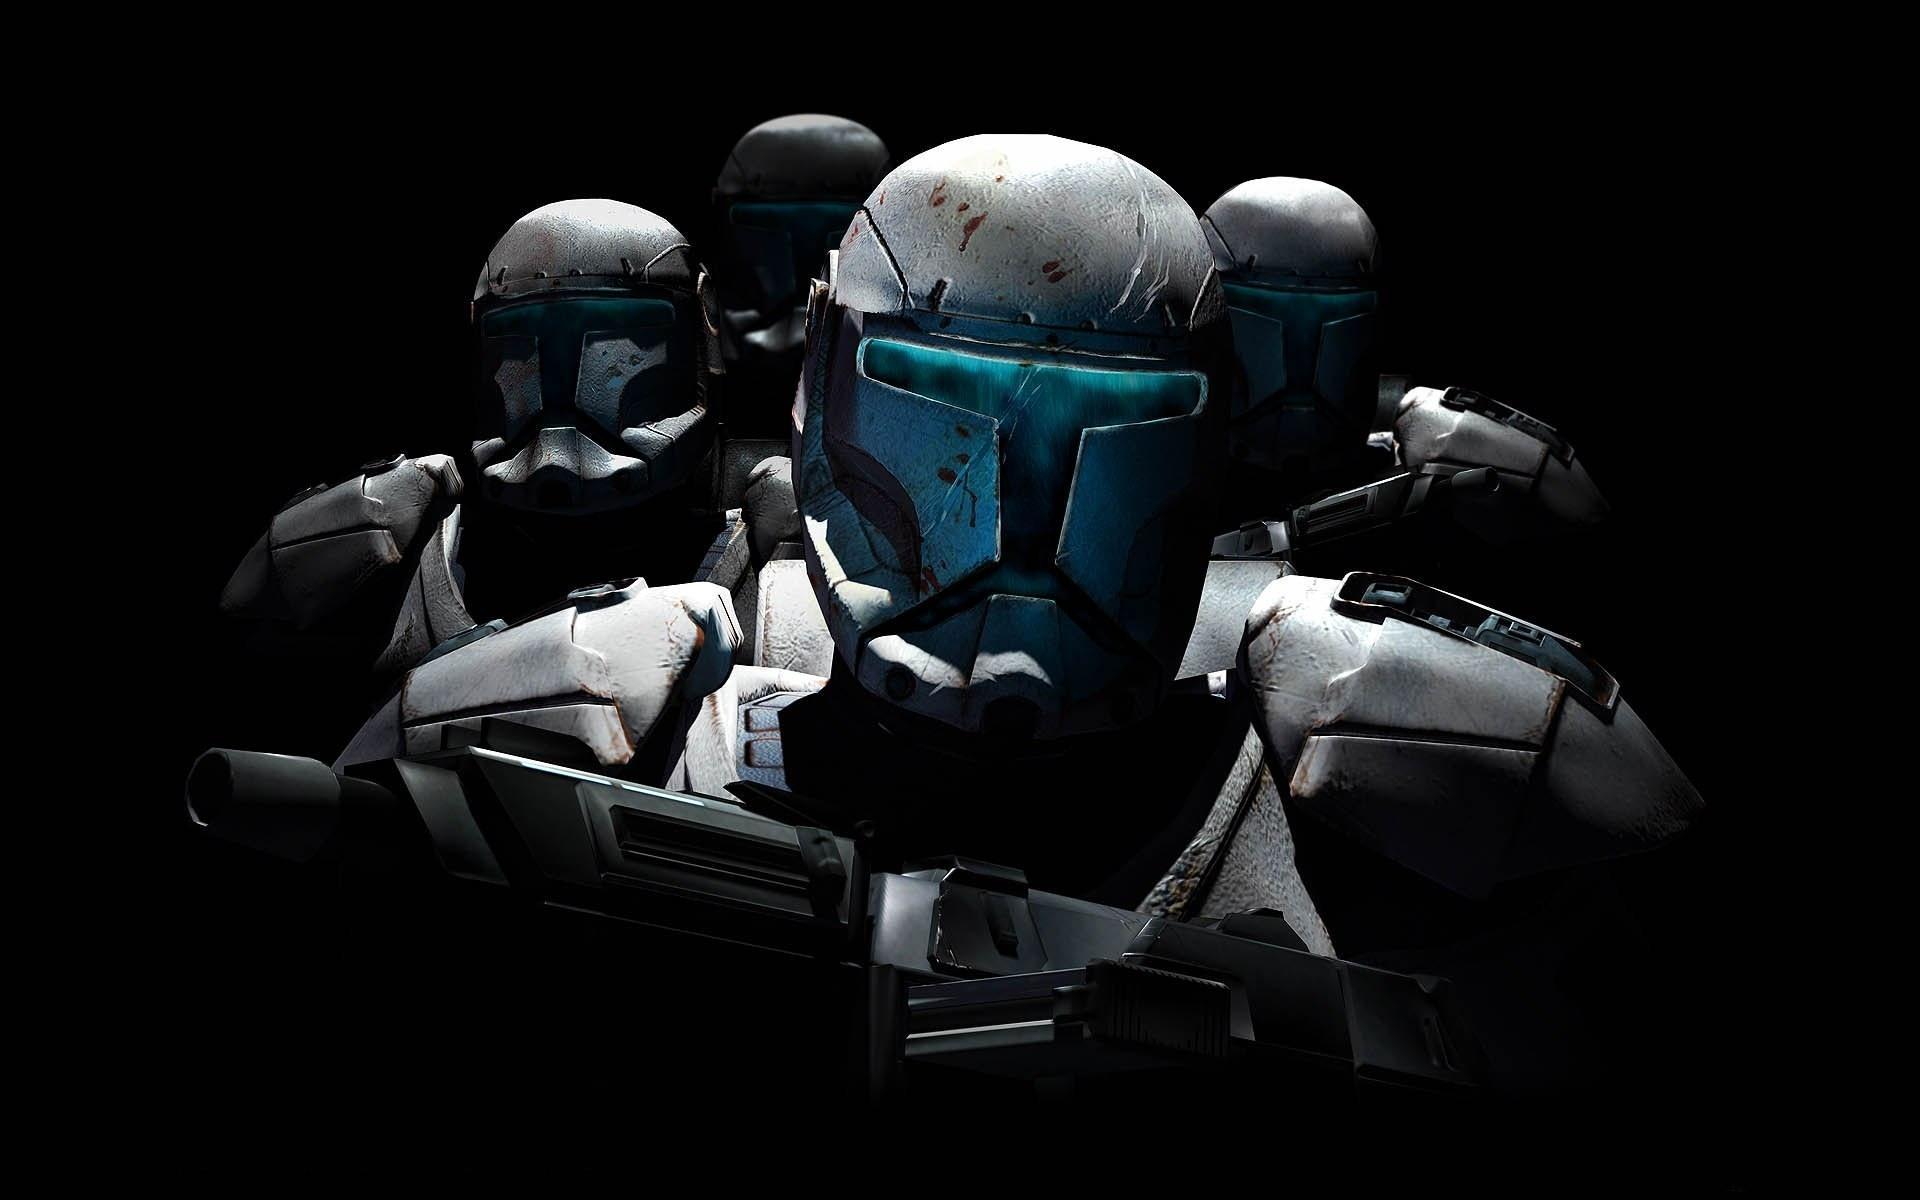 24 248064 hd star wars stormtroopers wallpaper cool starwars backgrounds